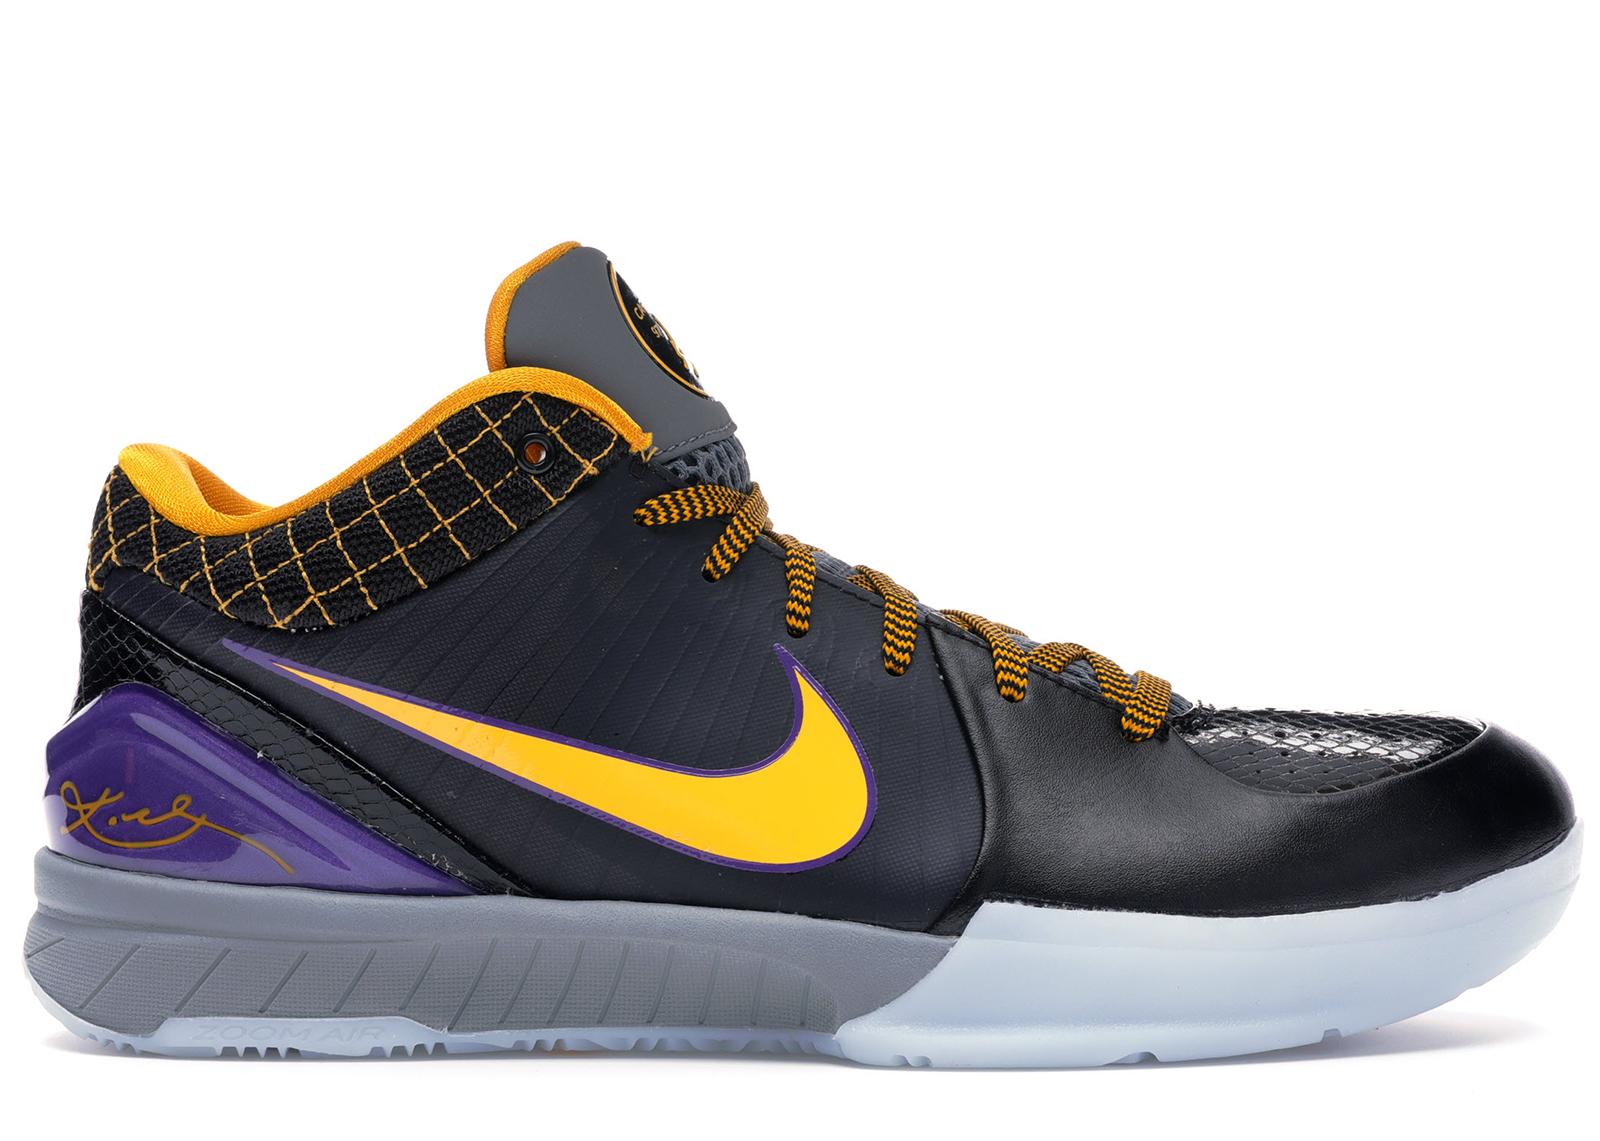 Buy Nike Kobe 4 Shoes & Deadstock Sneakers